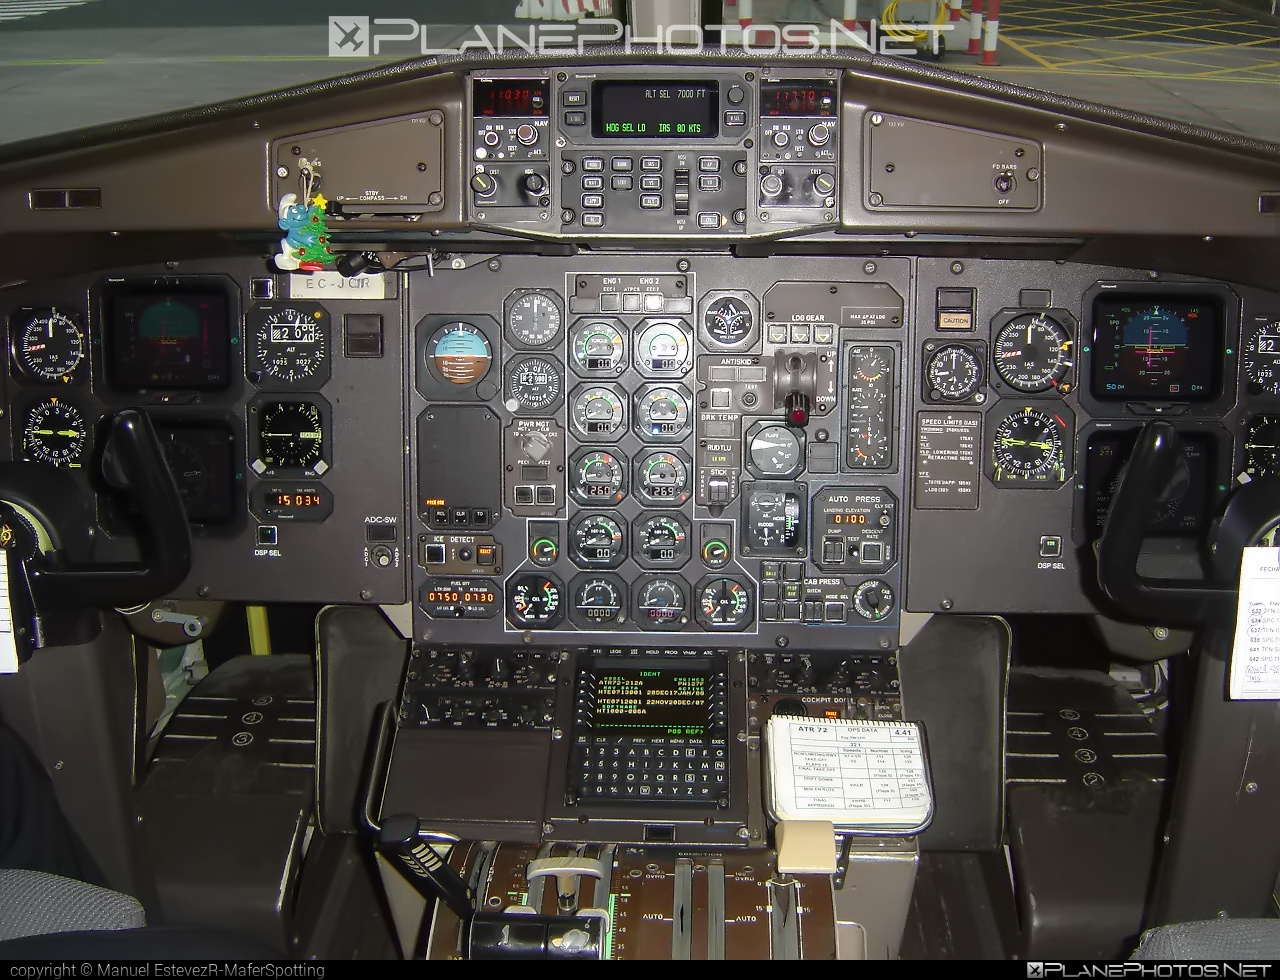 ATR 72-212A - EC-JCR operated by Binter Canarias #atr